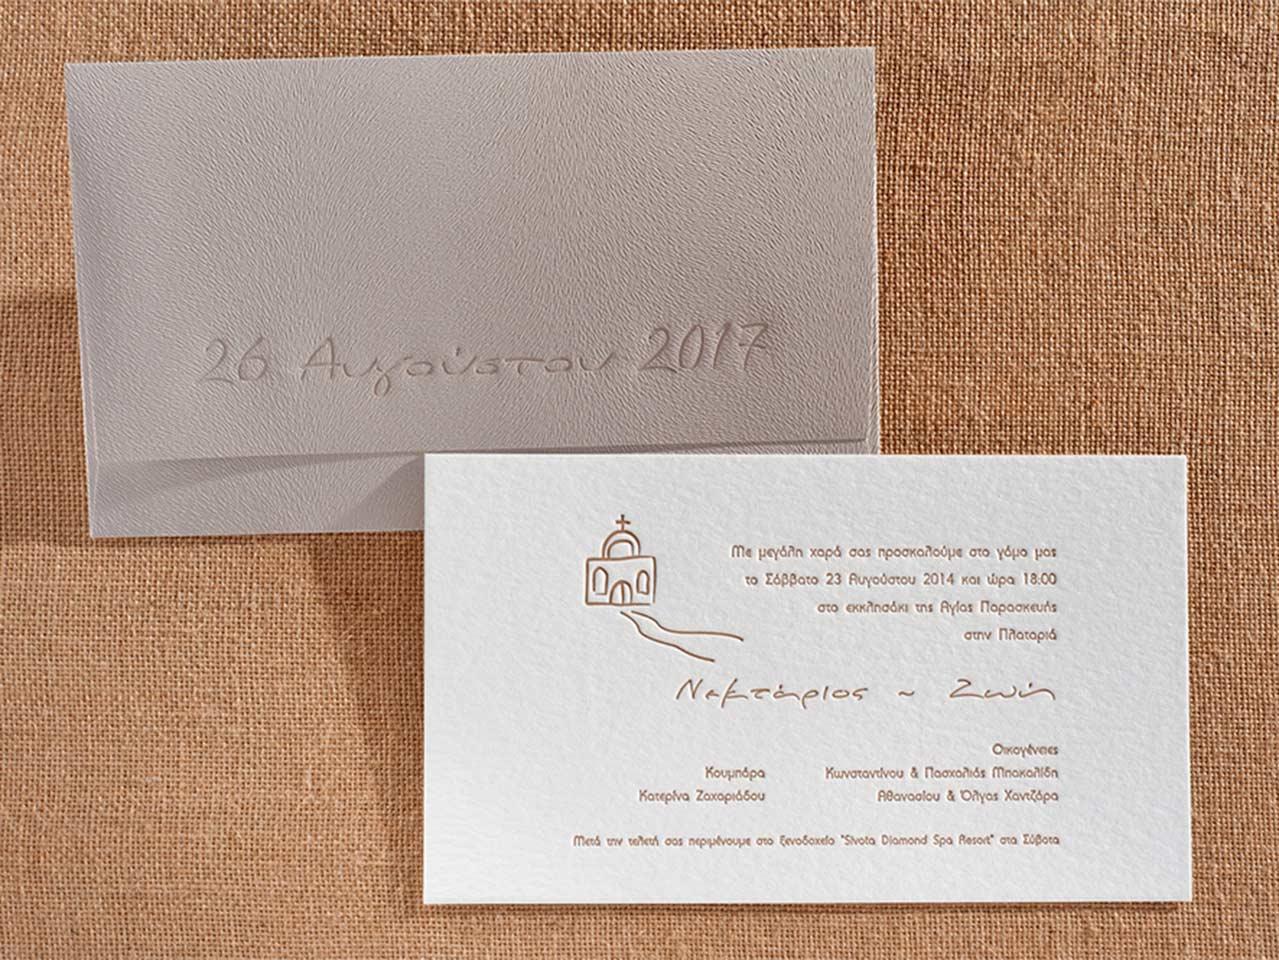 fd9178e43bac Προσκλητήριο Γάμου Εκκλησάκι με Εκτύπωση Letter Press